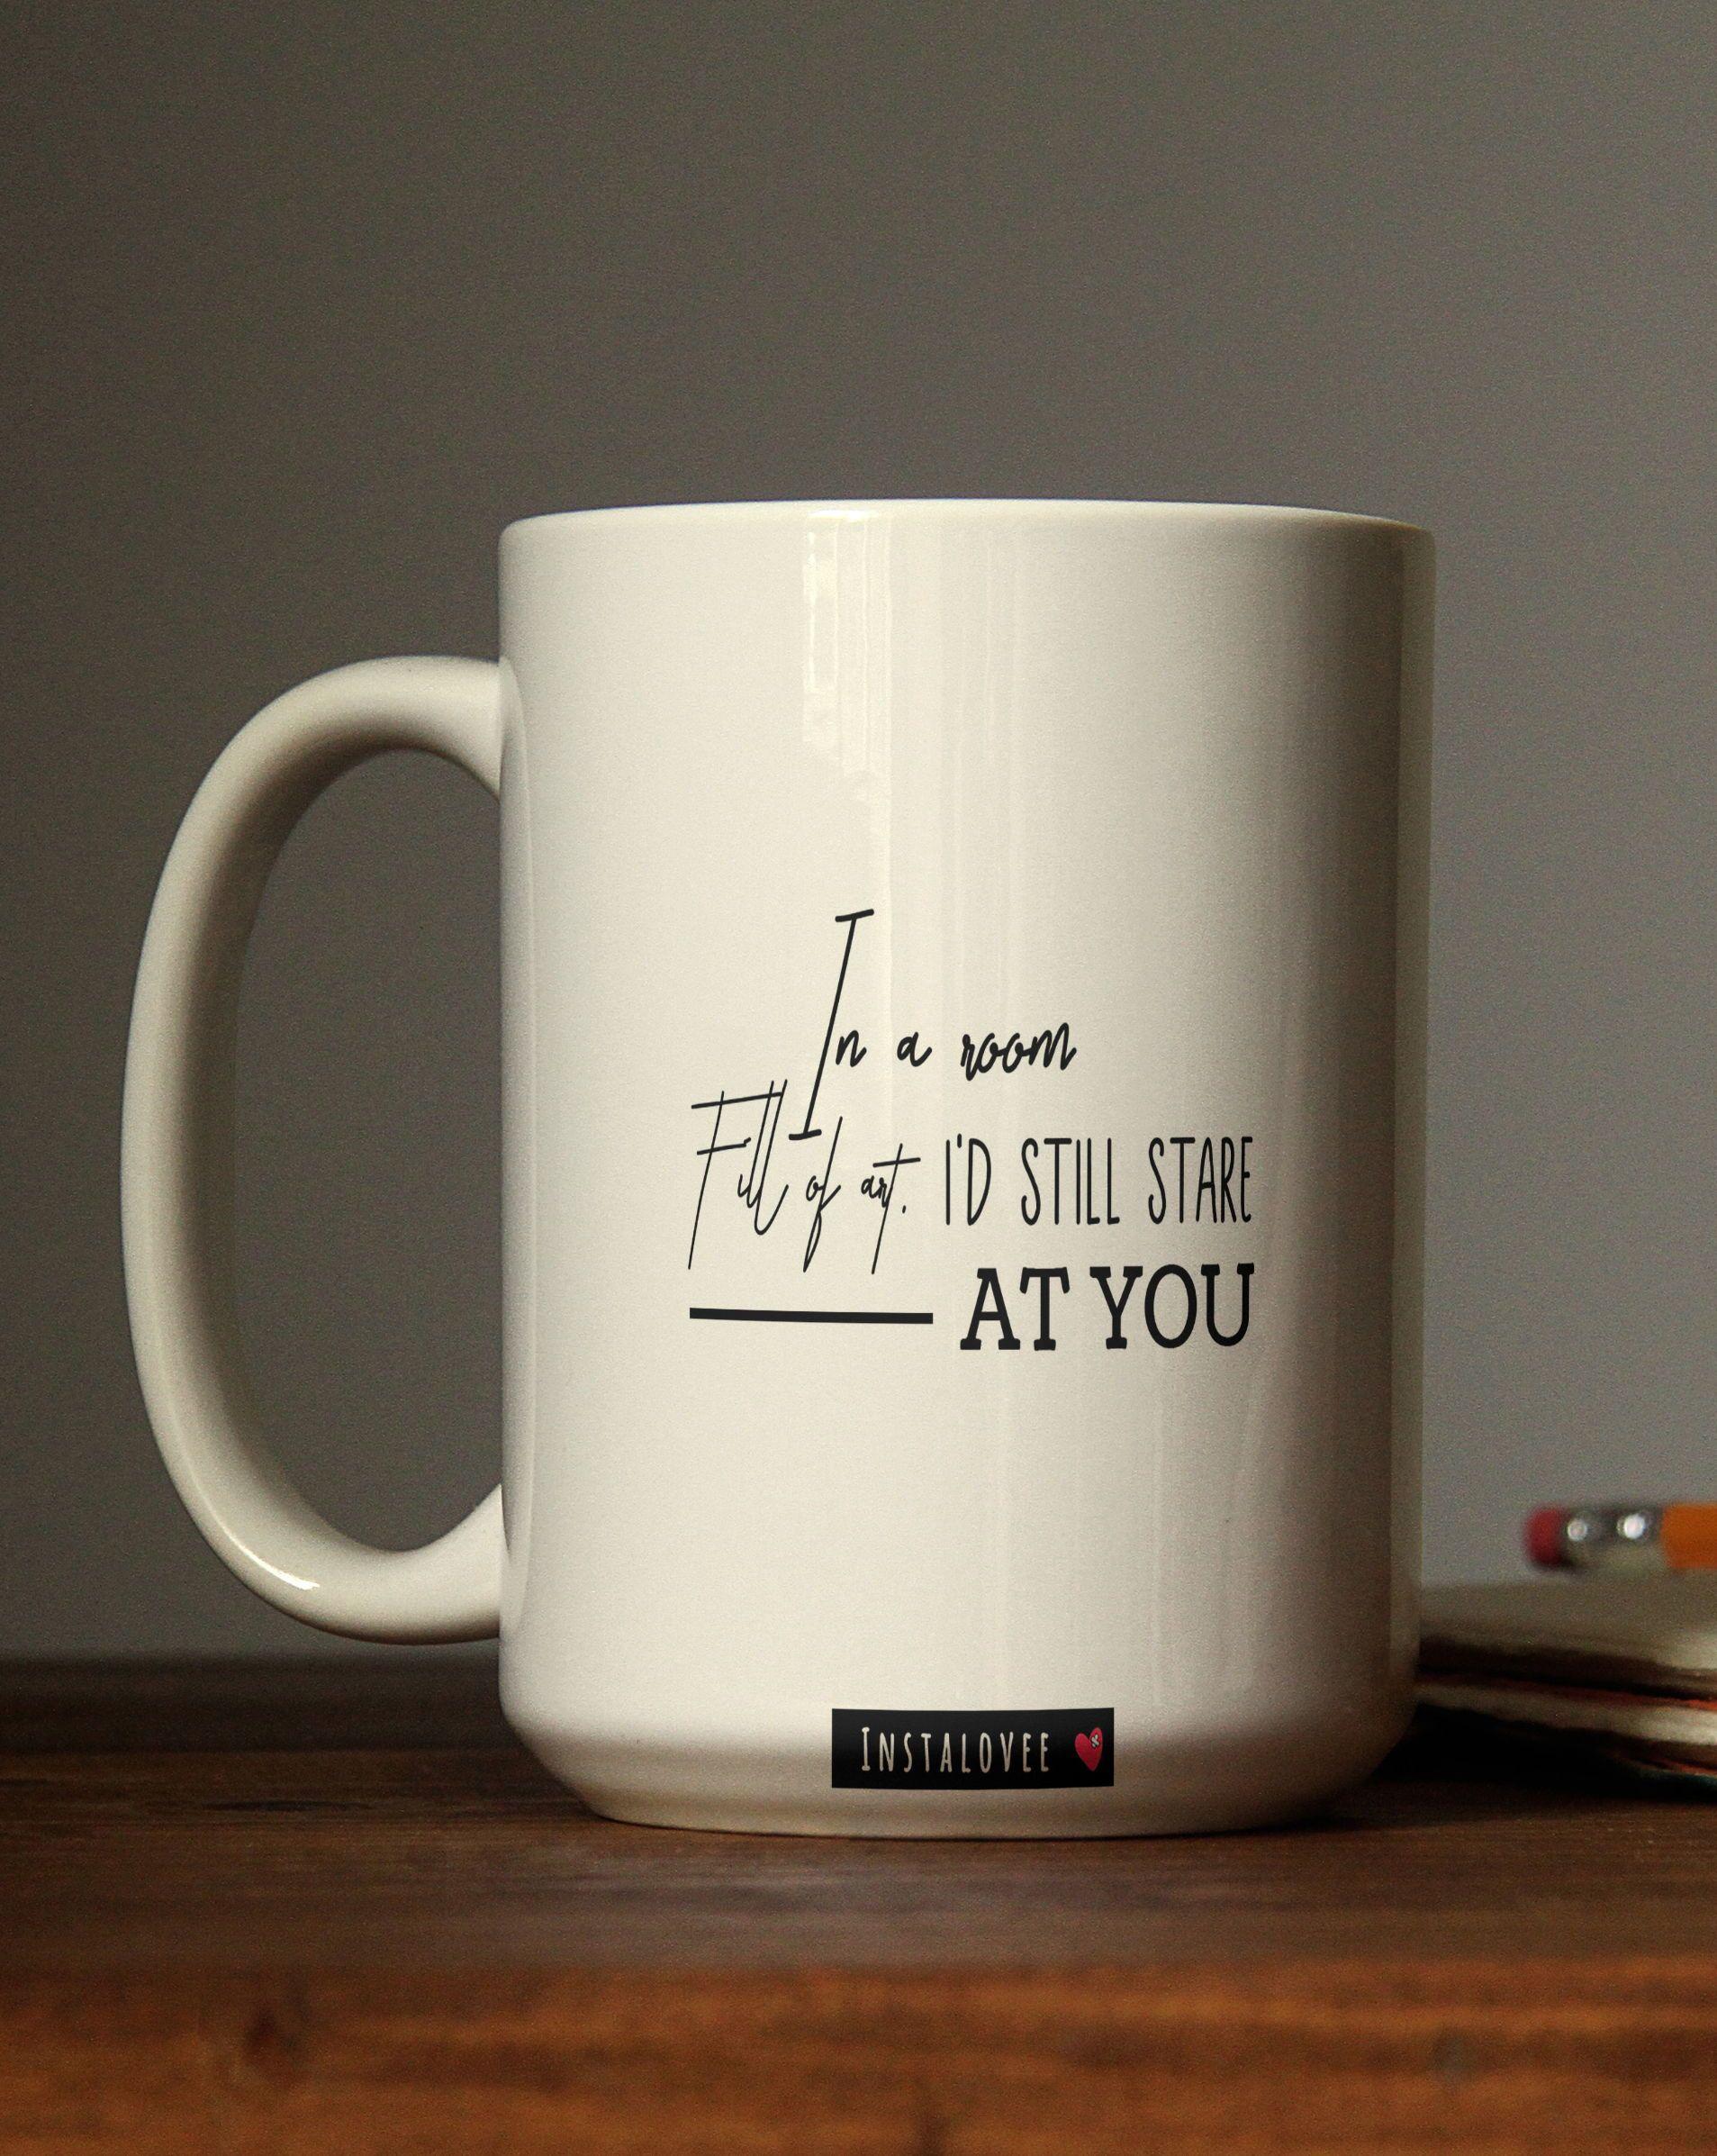 by instalovee custom mugs diy custom mugs photos funny mugs motivational and inspirational quotes mugs motivational quotes coffee mugs tea mugs christmas mugs cute mugs f...